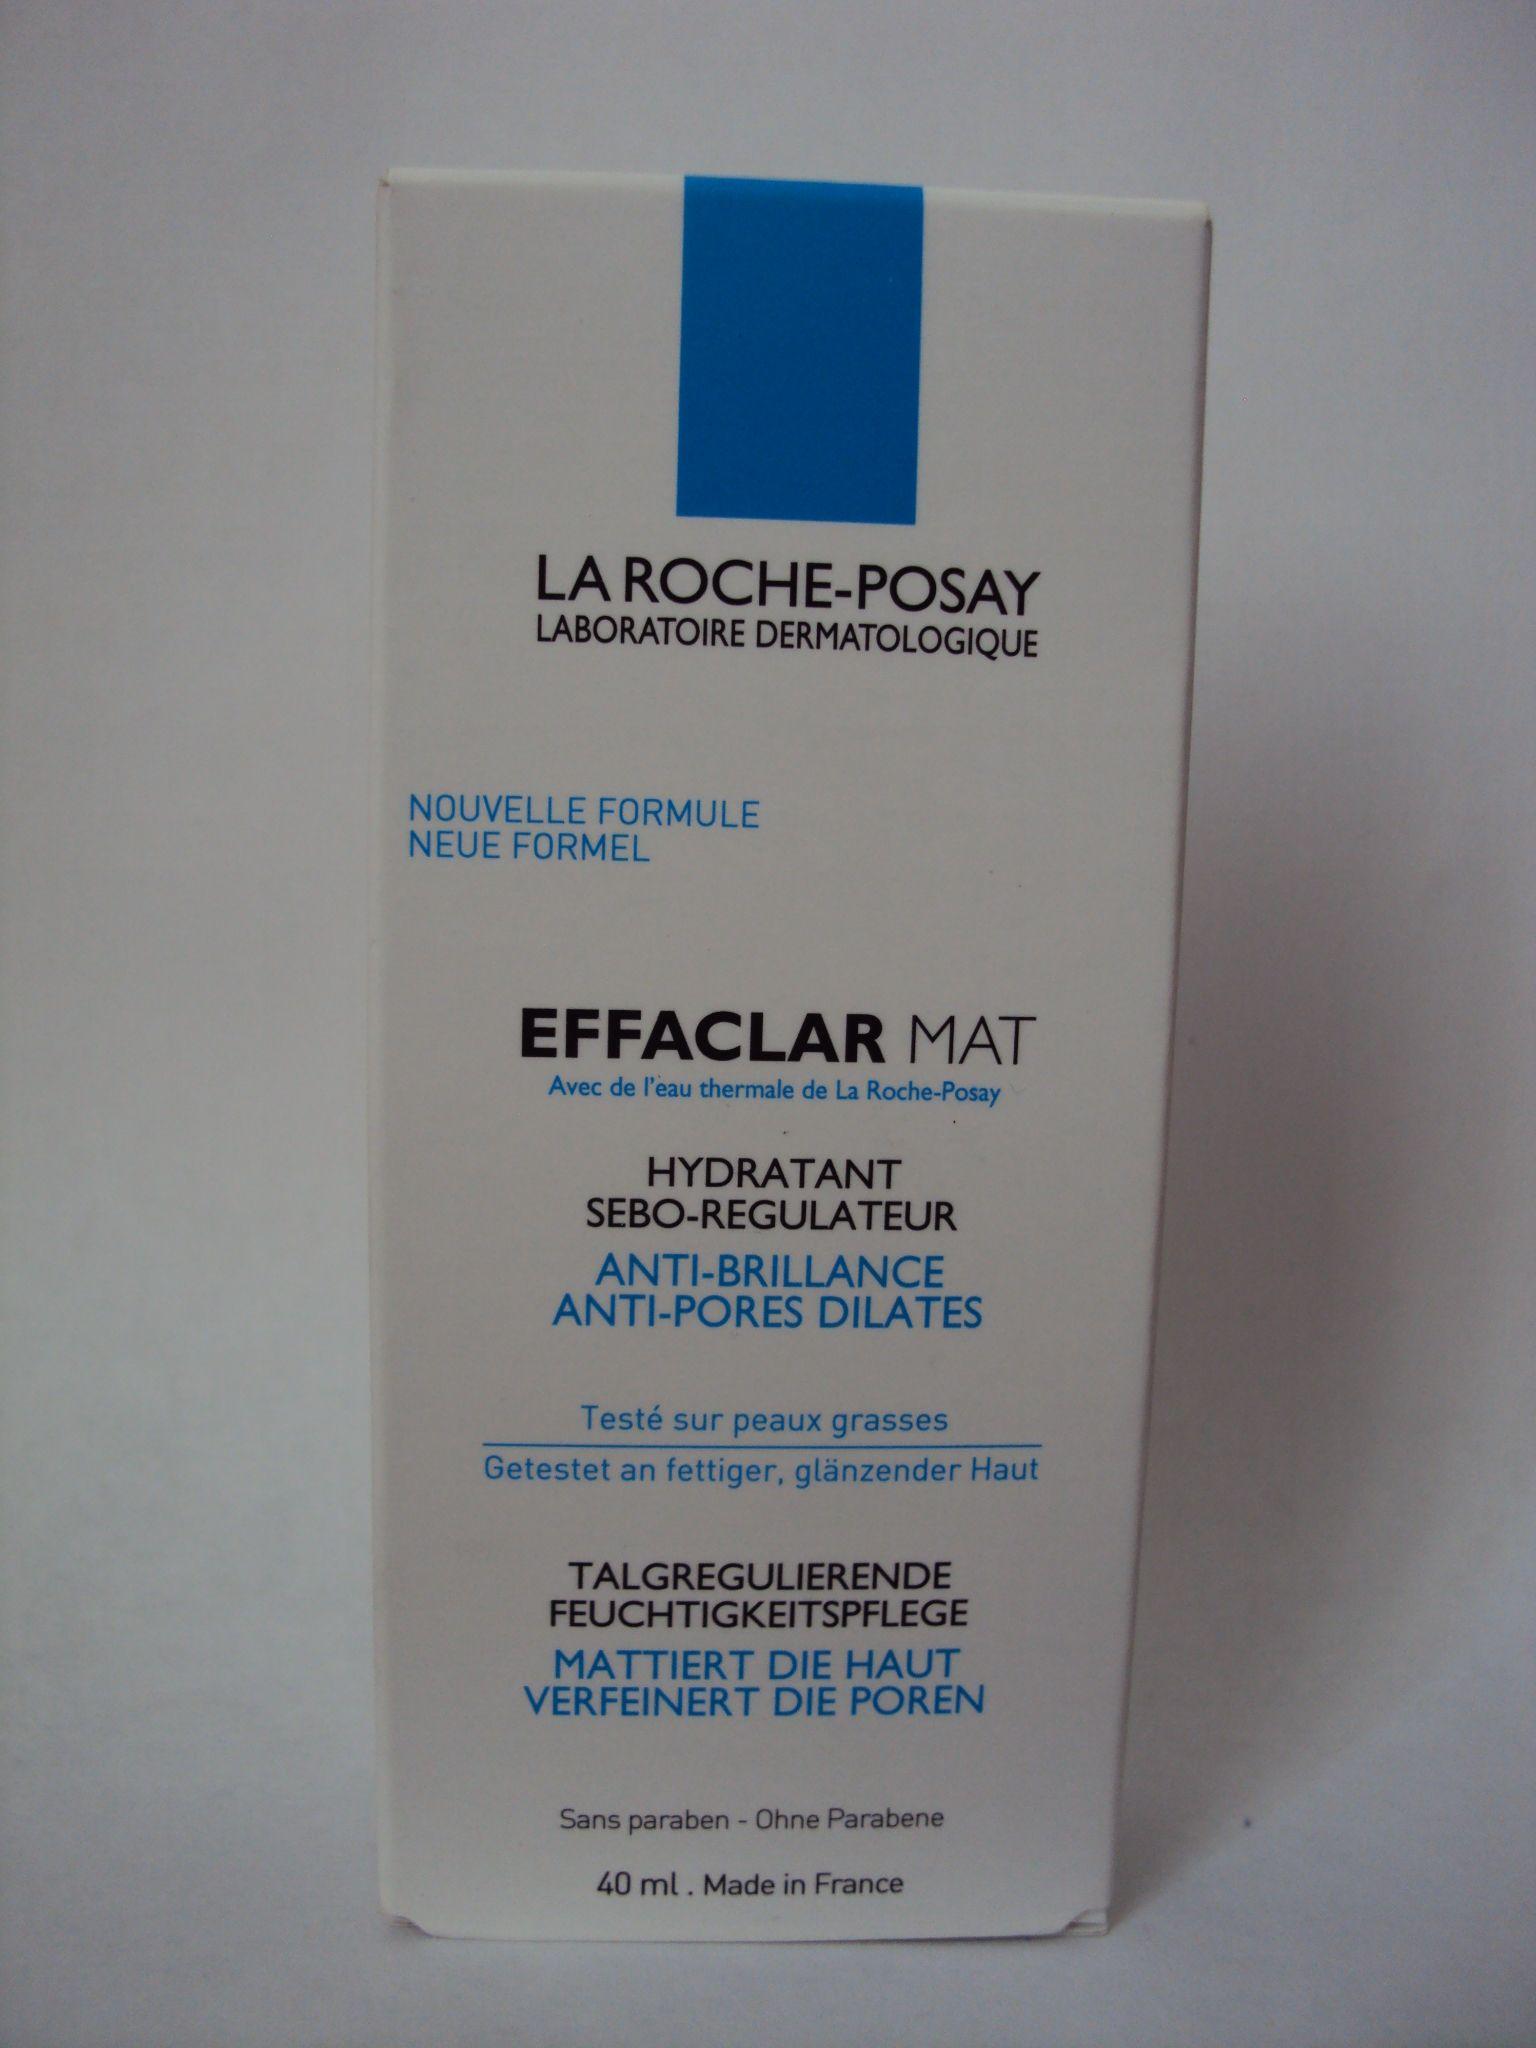 face la roche for serum acid amazon dp with luxury mats glycolic effaclar posay com skin hyaluronic oz beauty mat oily fl